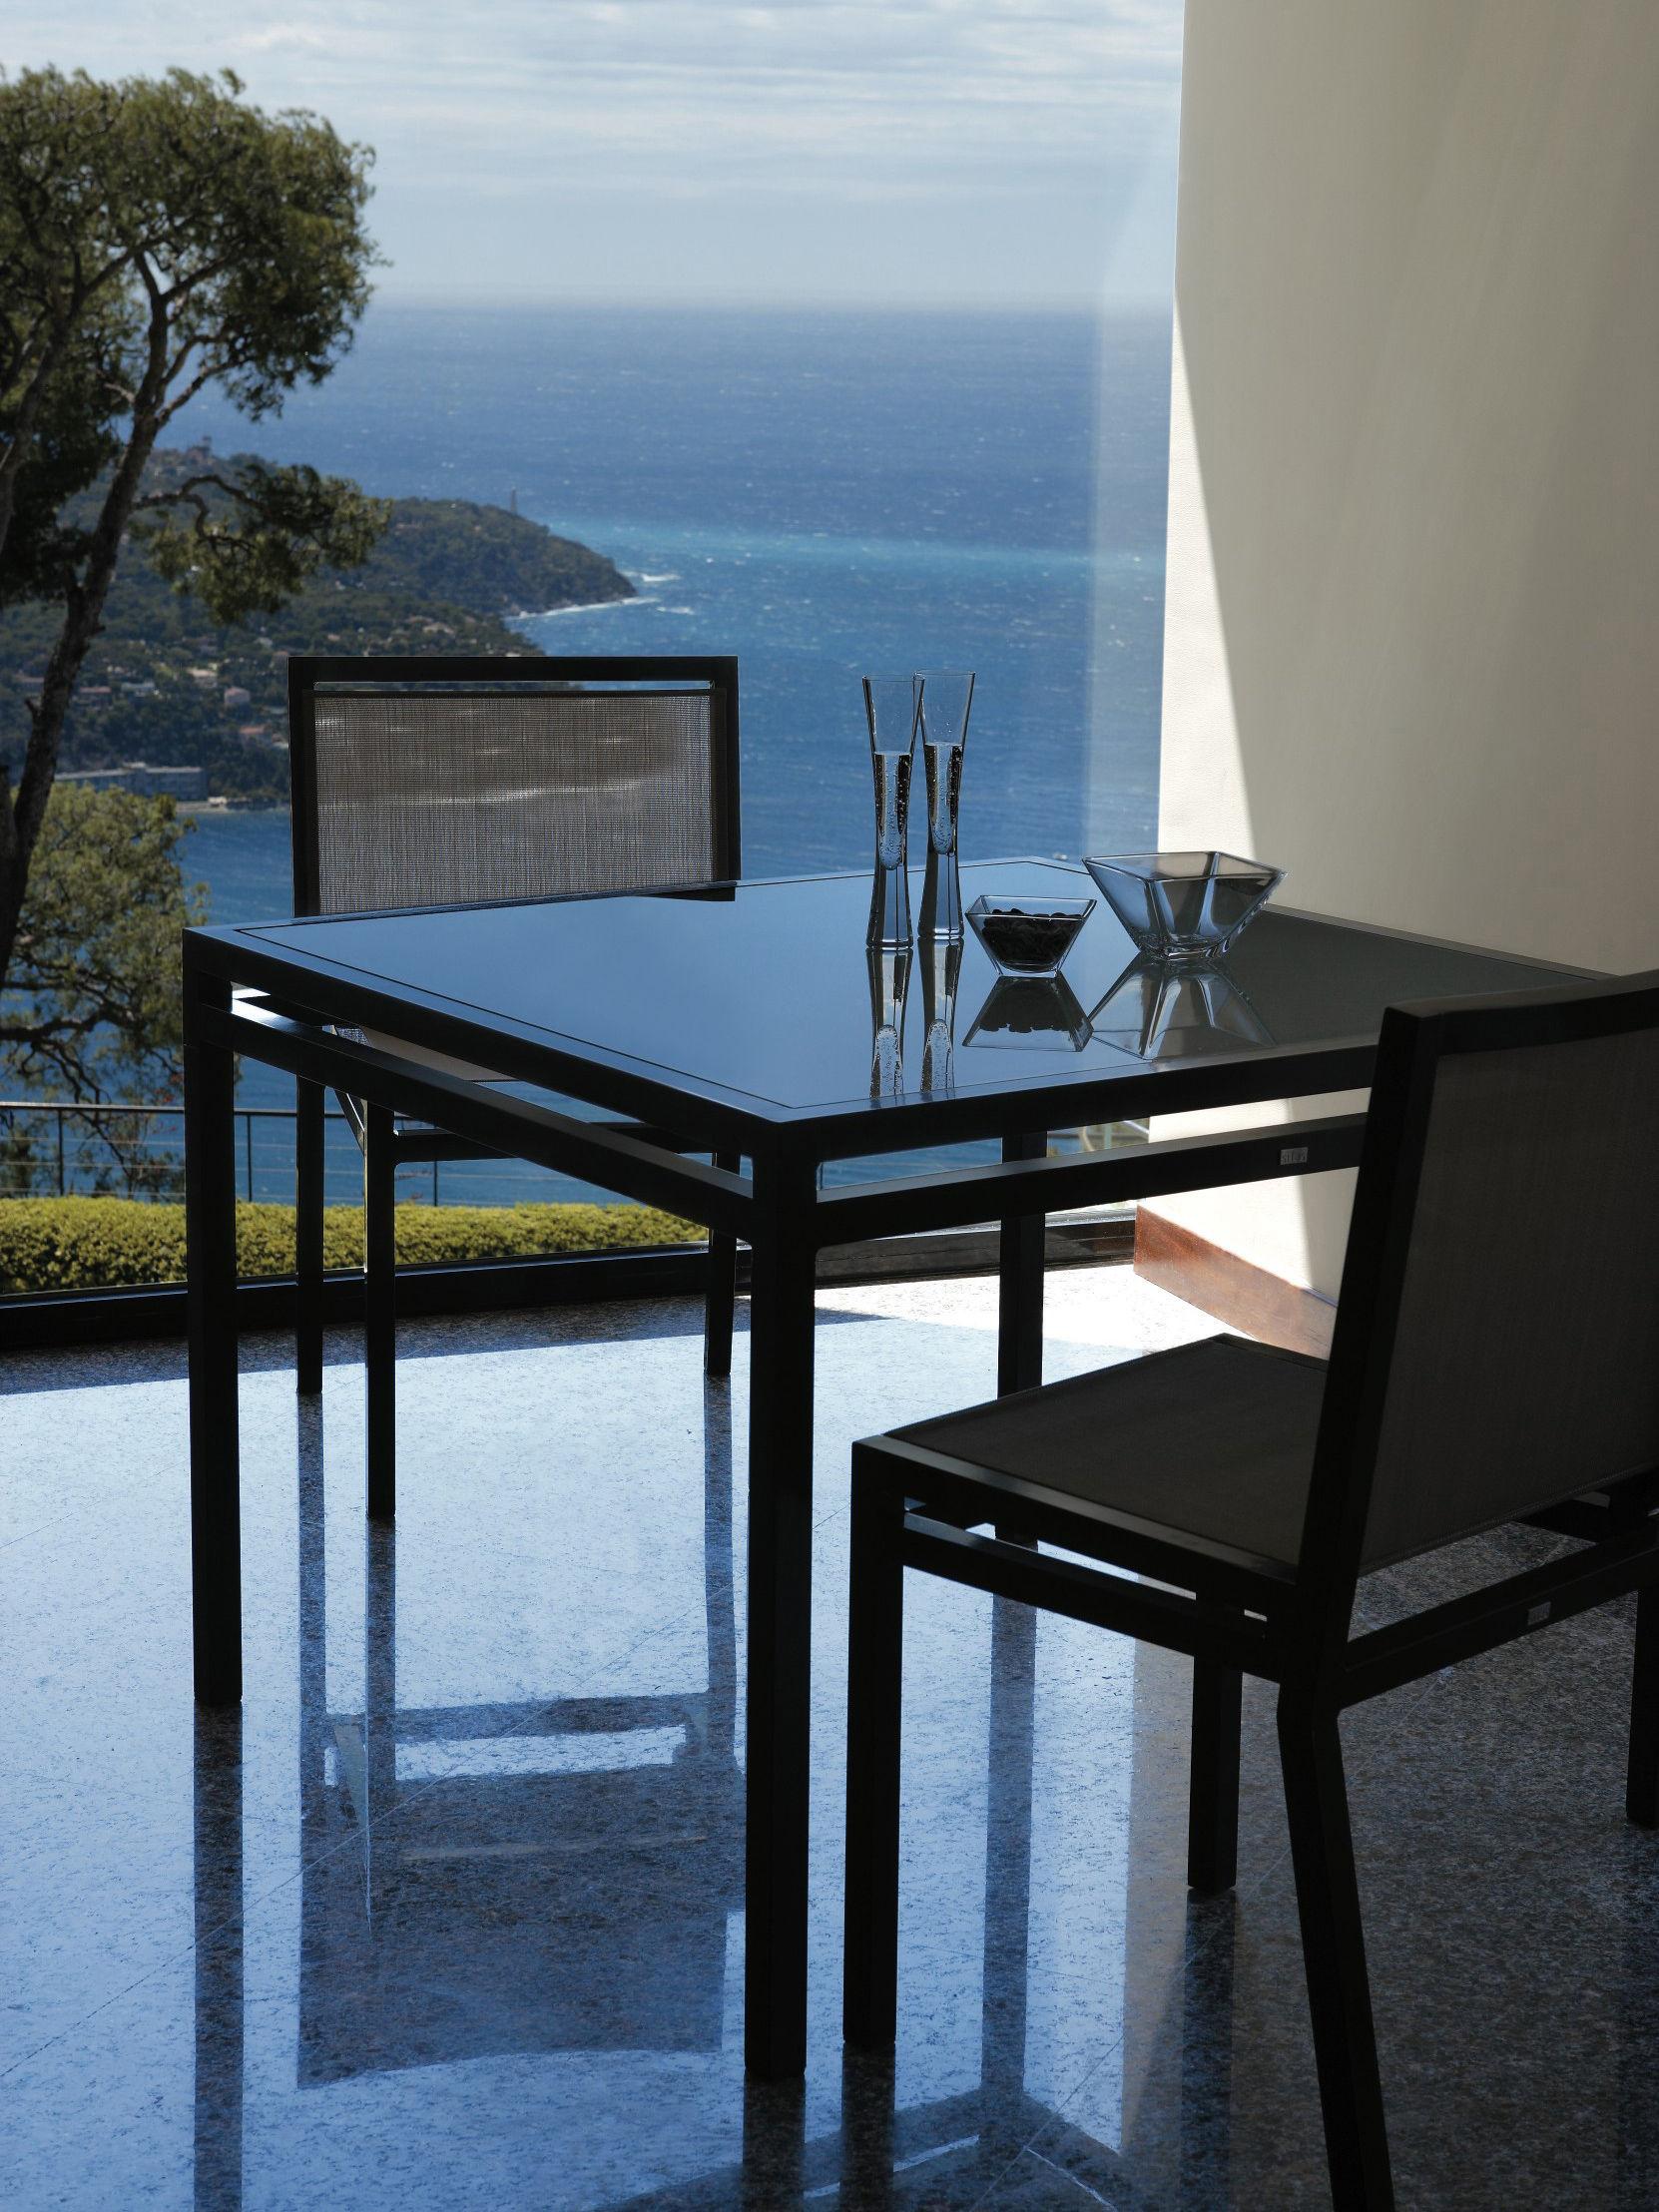 table de jardin kare free original 100 x 100 cm structure weng plateau verre blanc sifas. Black Bedroom Furniture Sets. Home Design Ideas